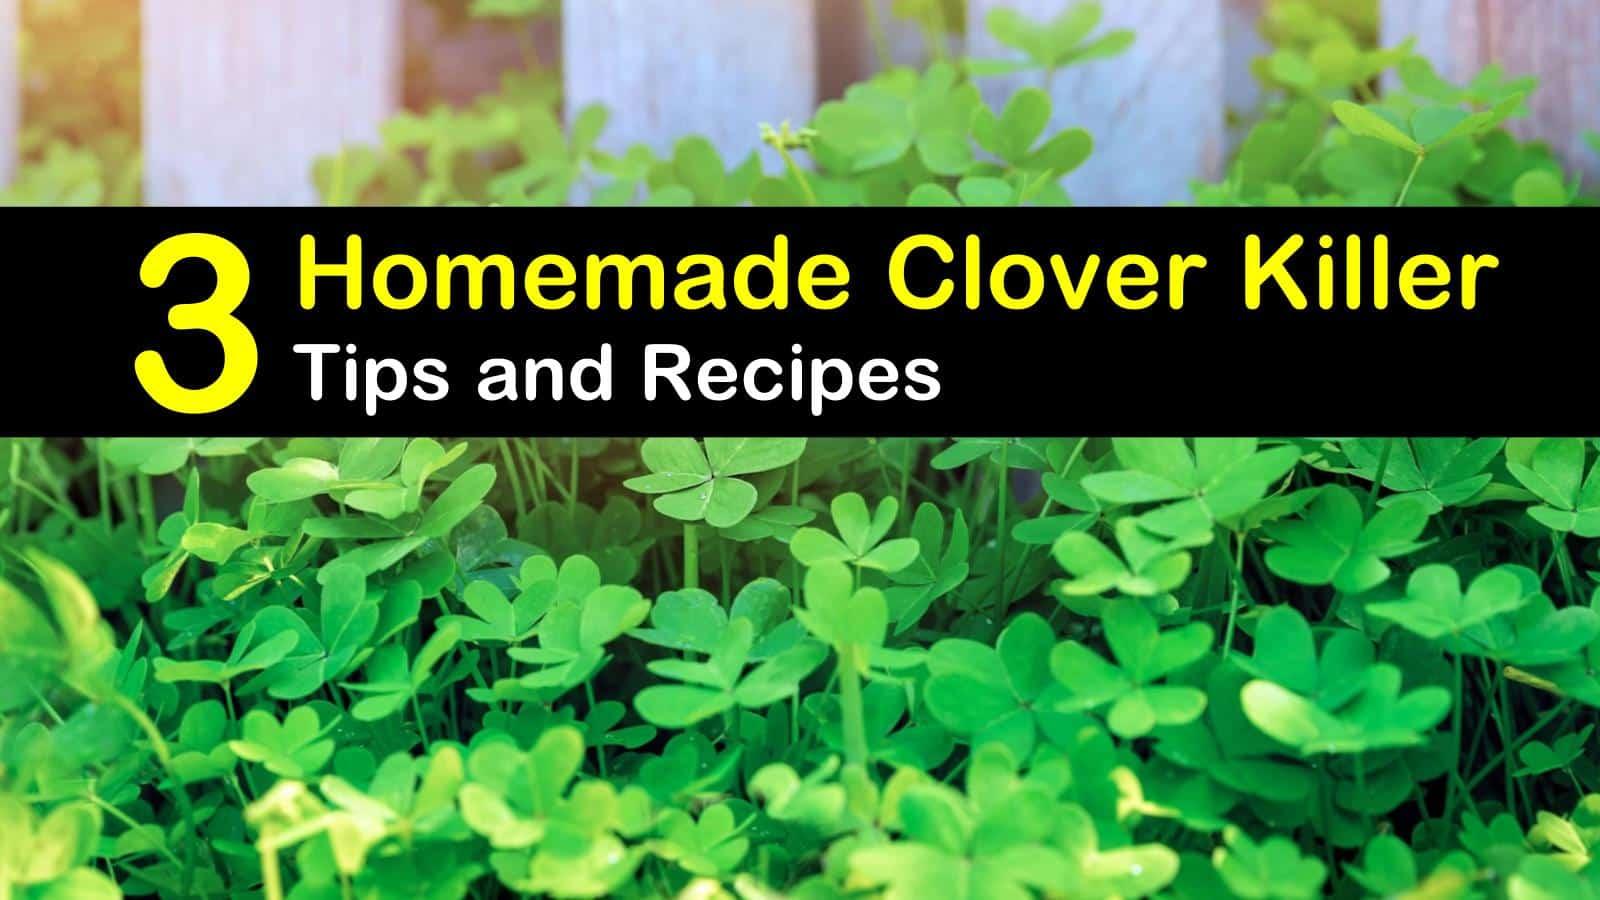 homemade clover killer titleimg1